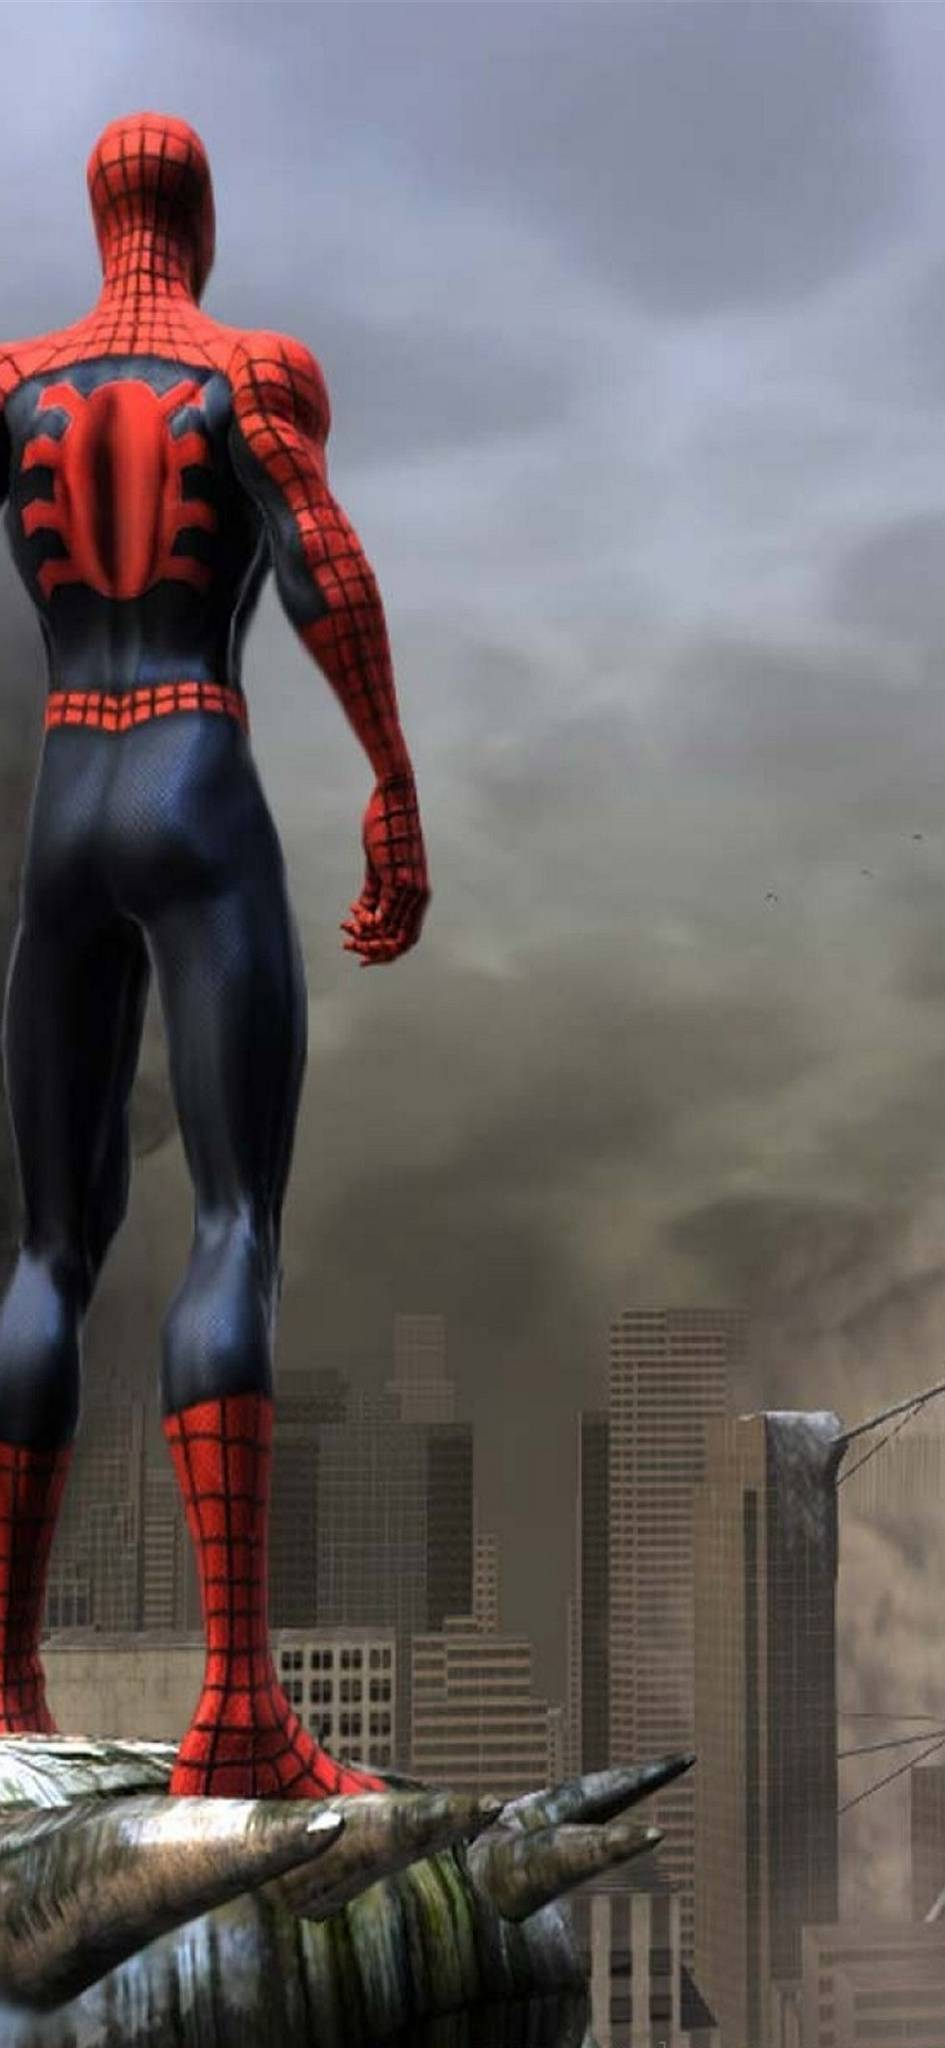 Spiderman Iphone 11 Pro Wallpaper Spider Man Web Of Shadows 945x2048 Wallpaper Teahub Io